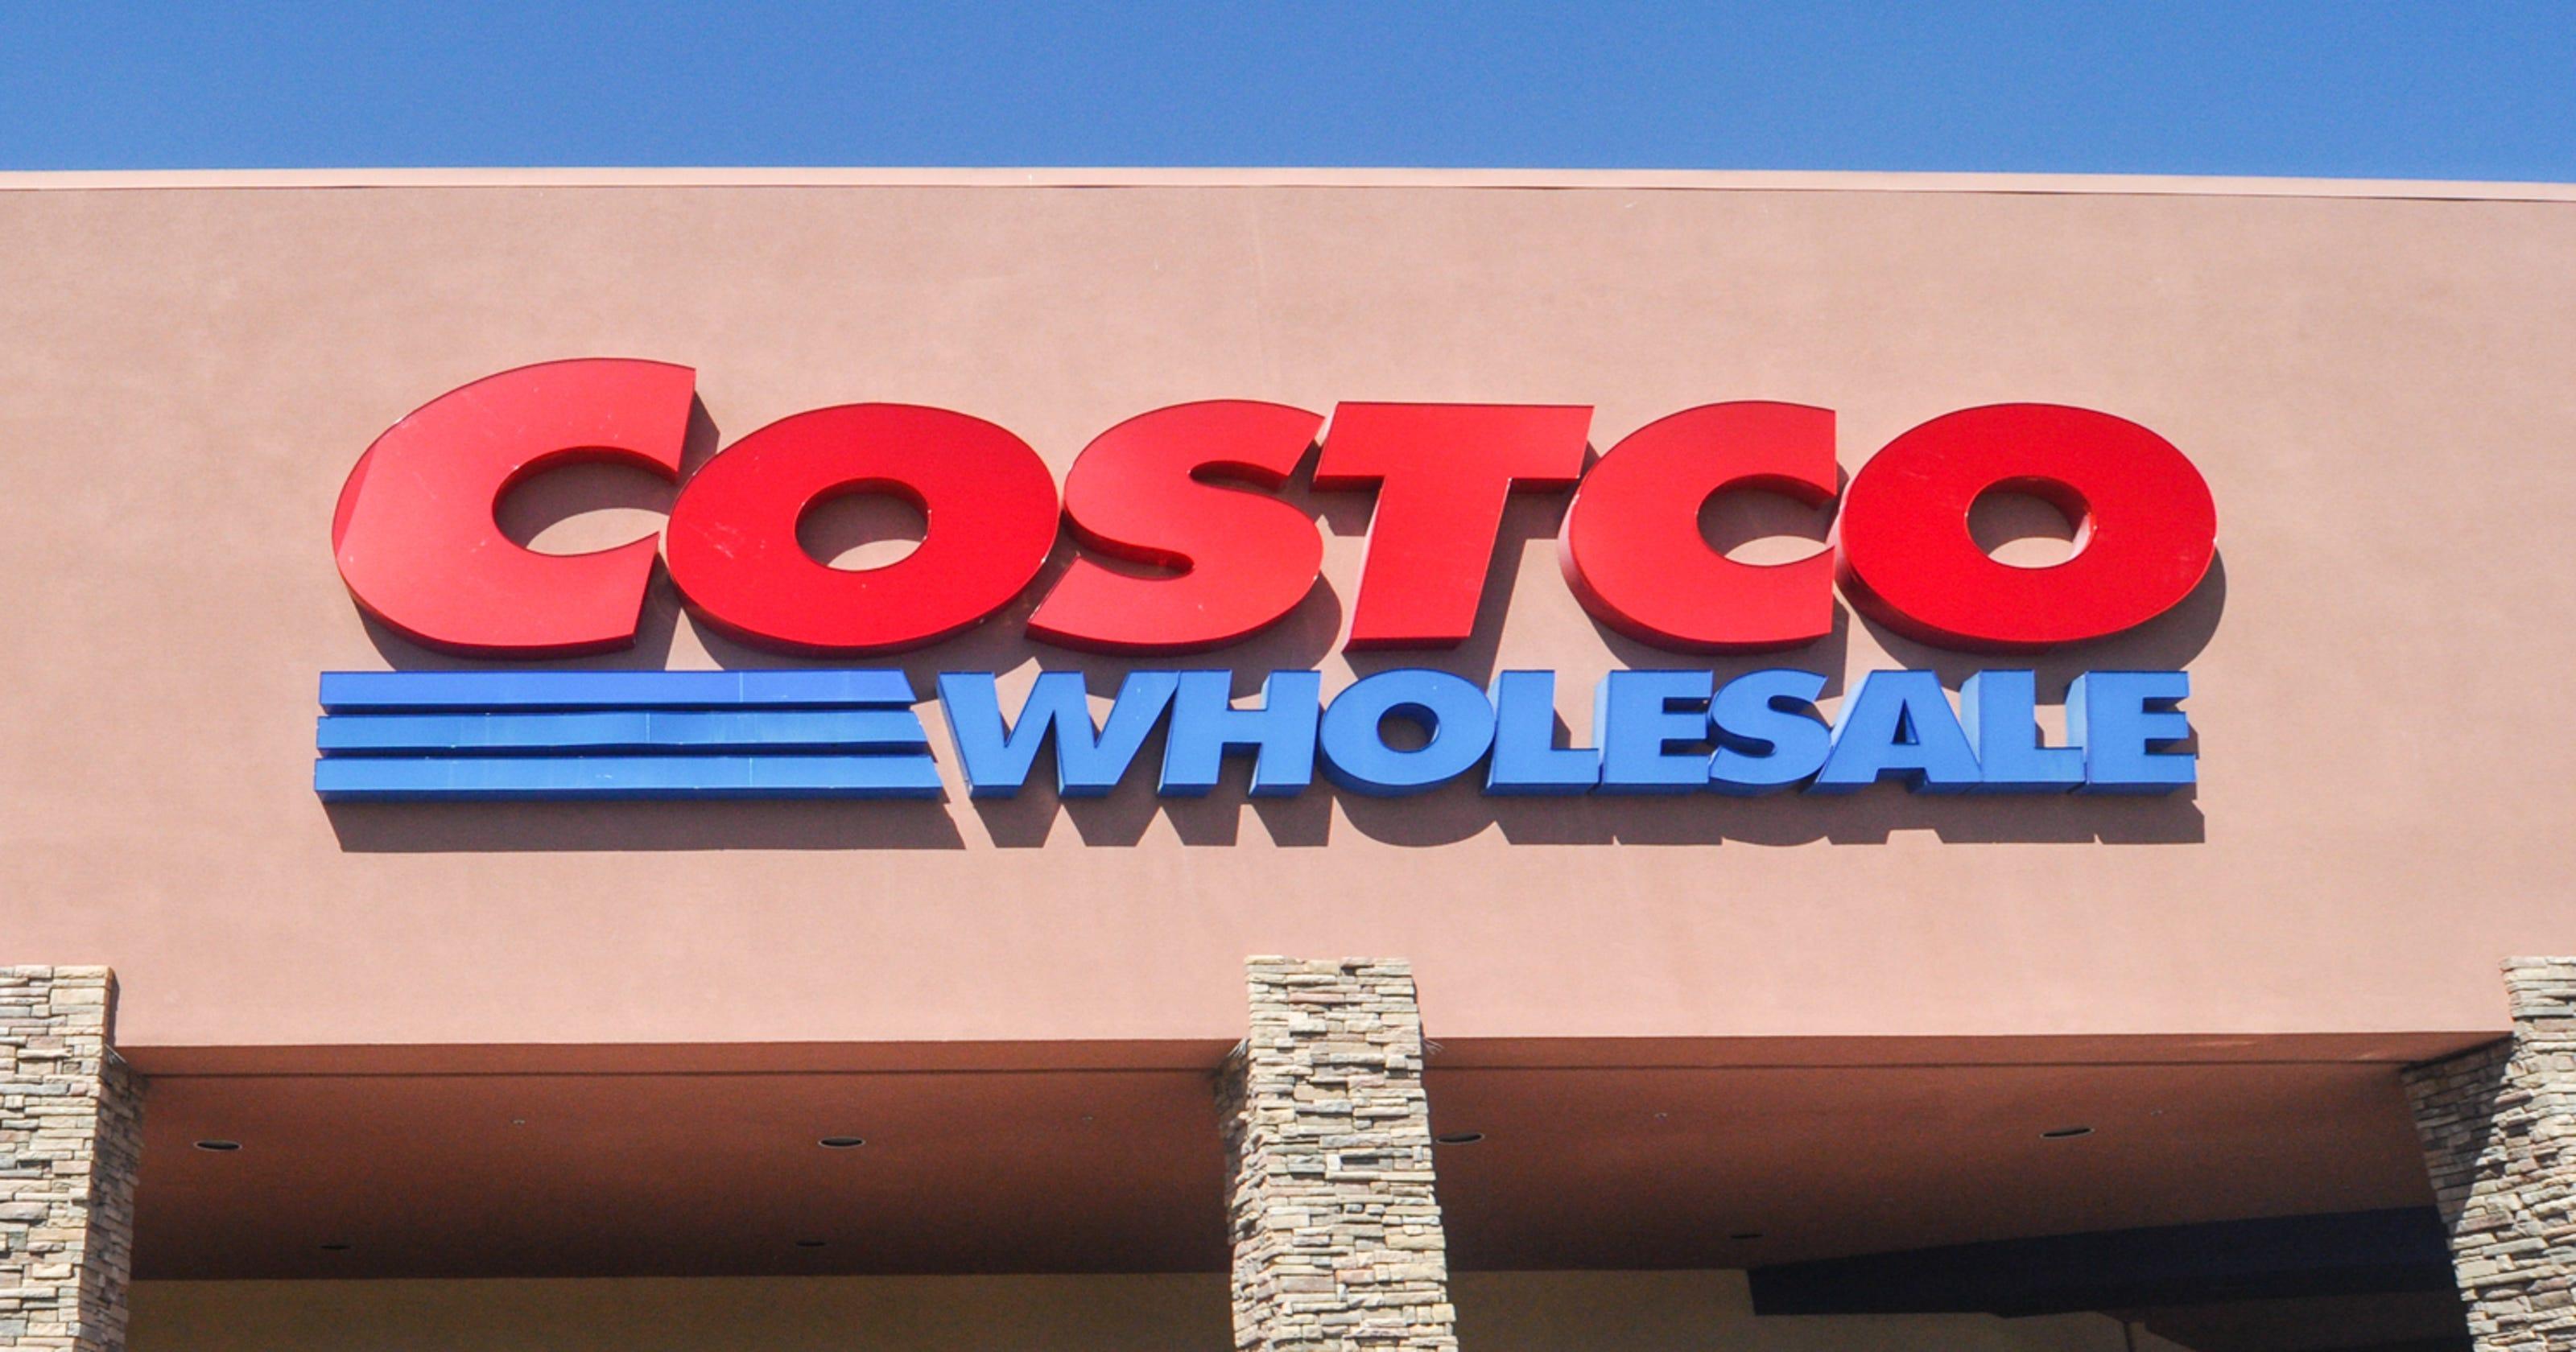 329bef9fa3 8 hidden benefits to your Costco membership